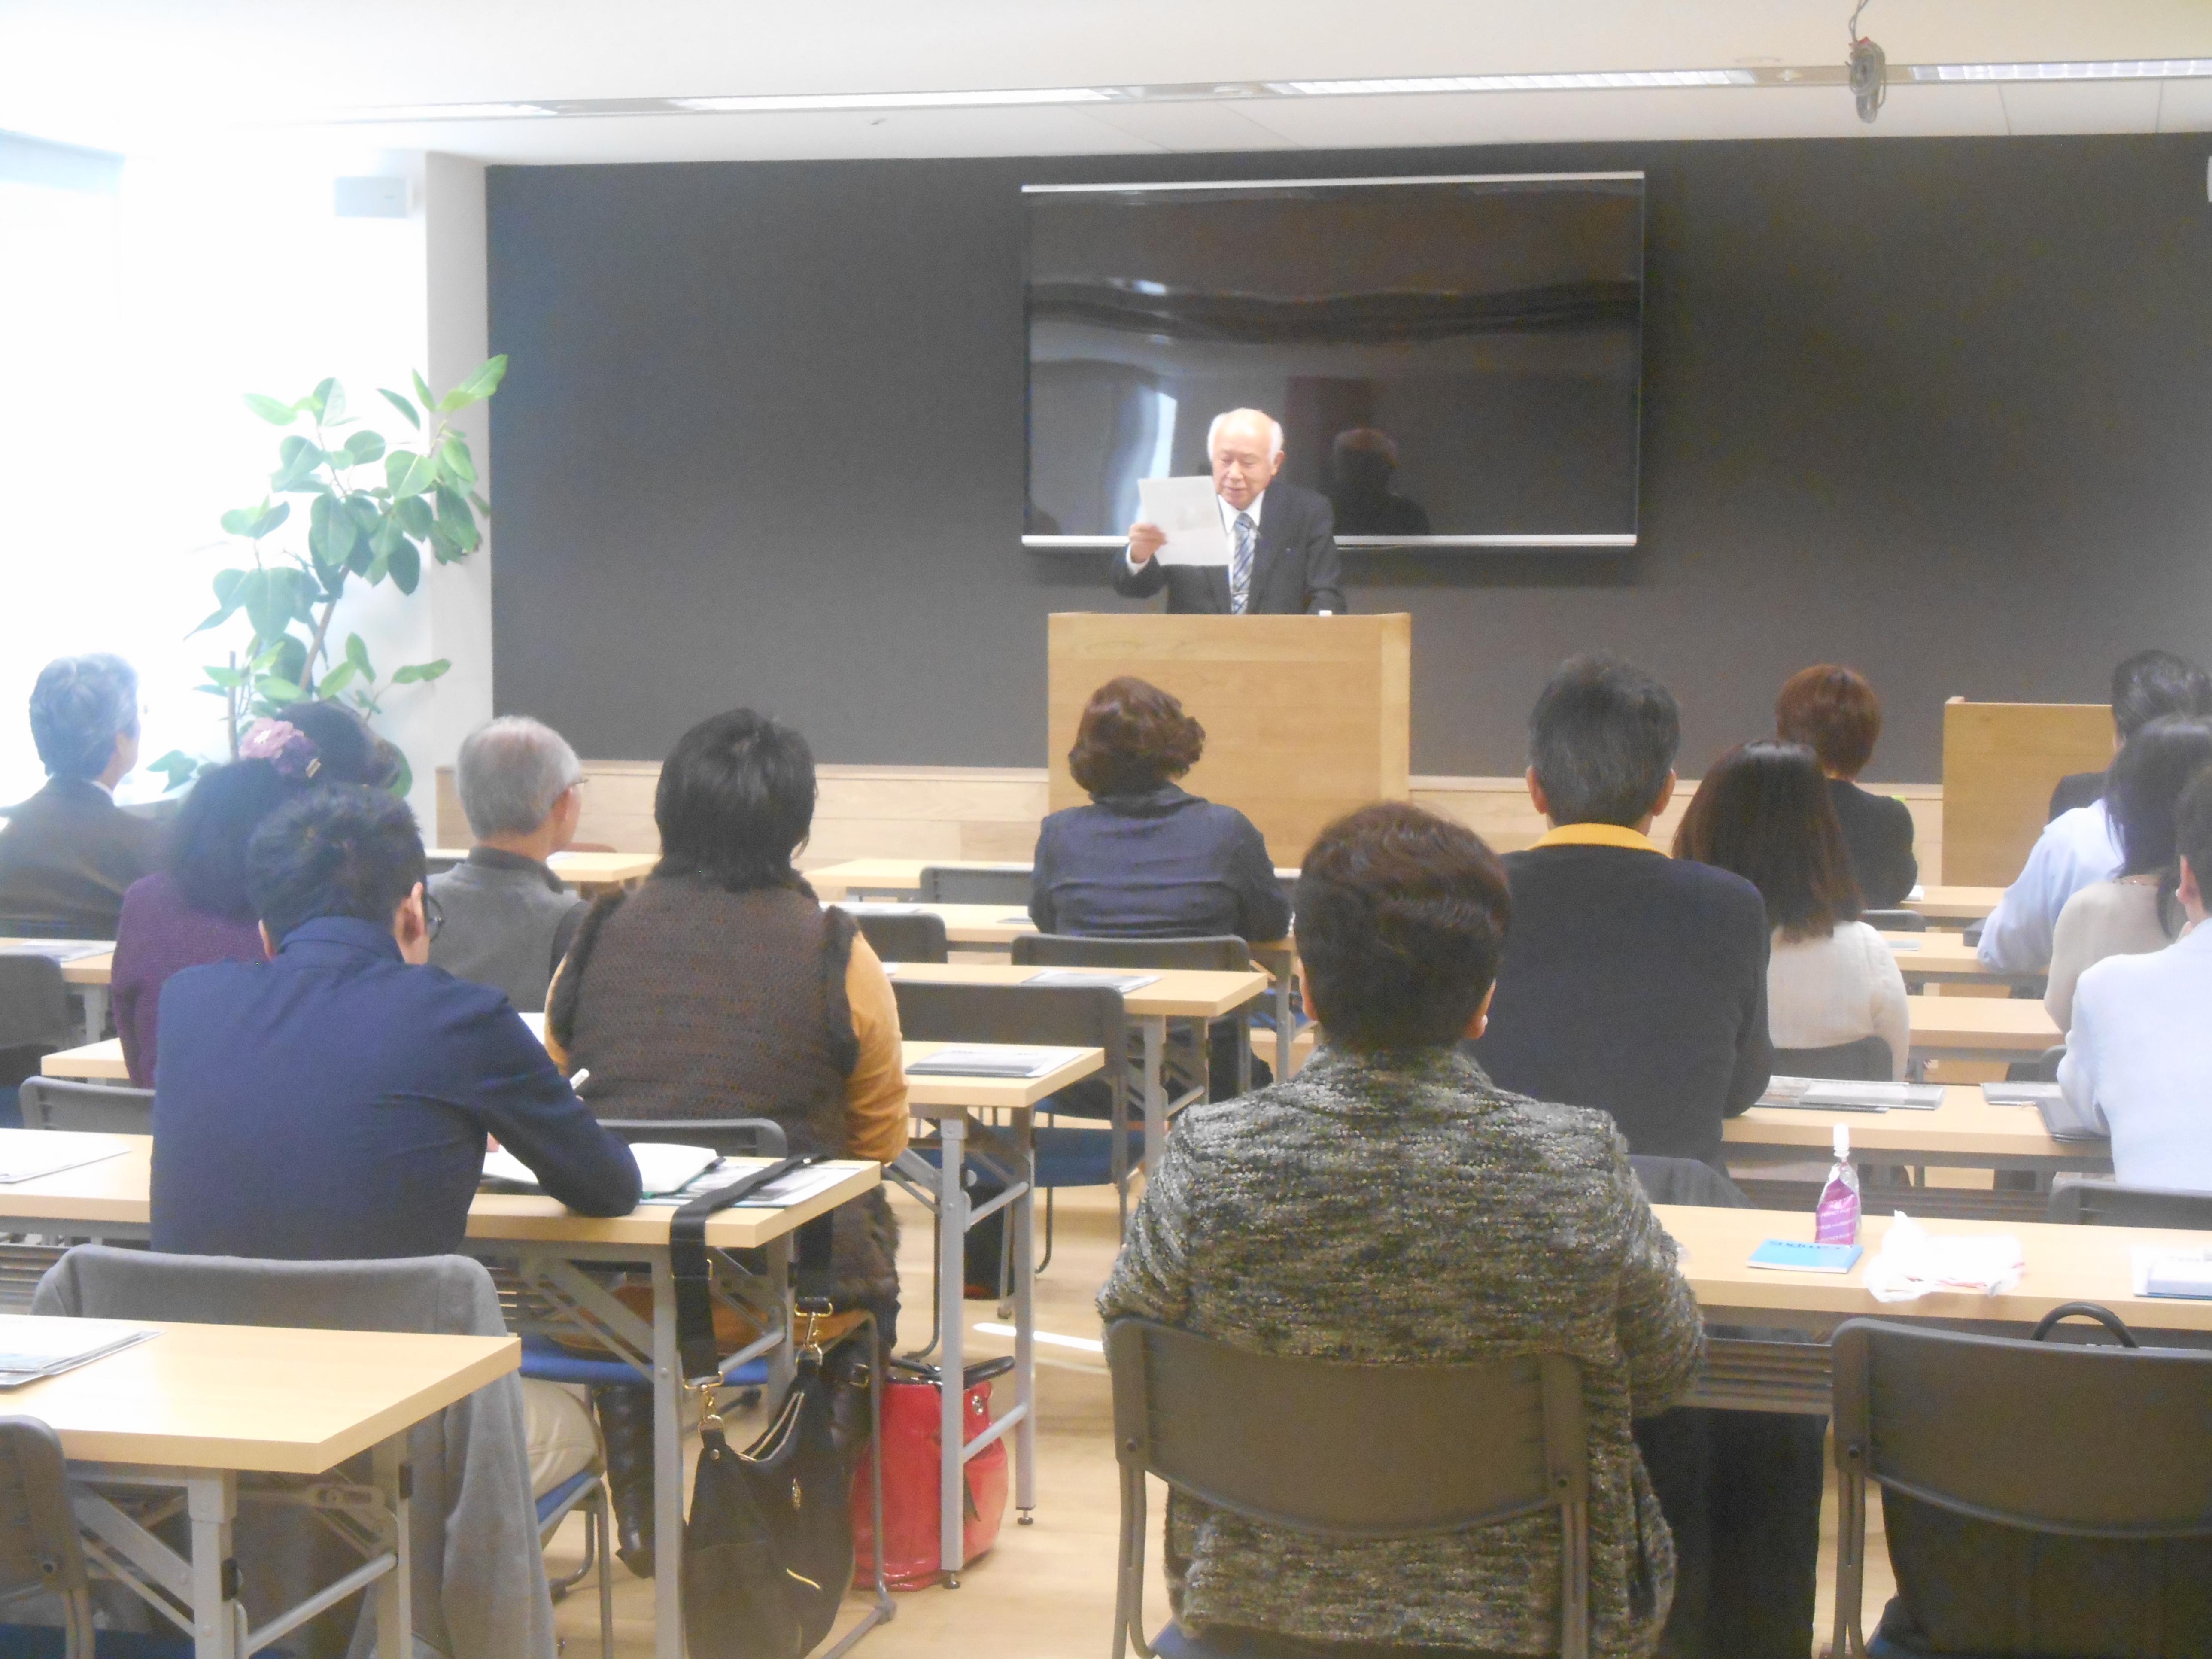 DSCN0429 - 2017年2月4日東京思風塾開催